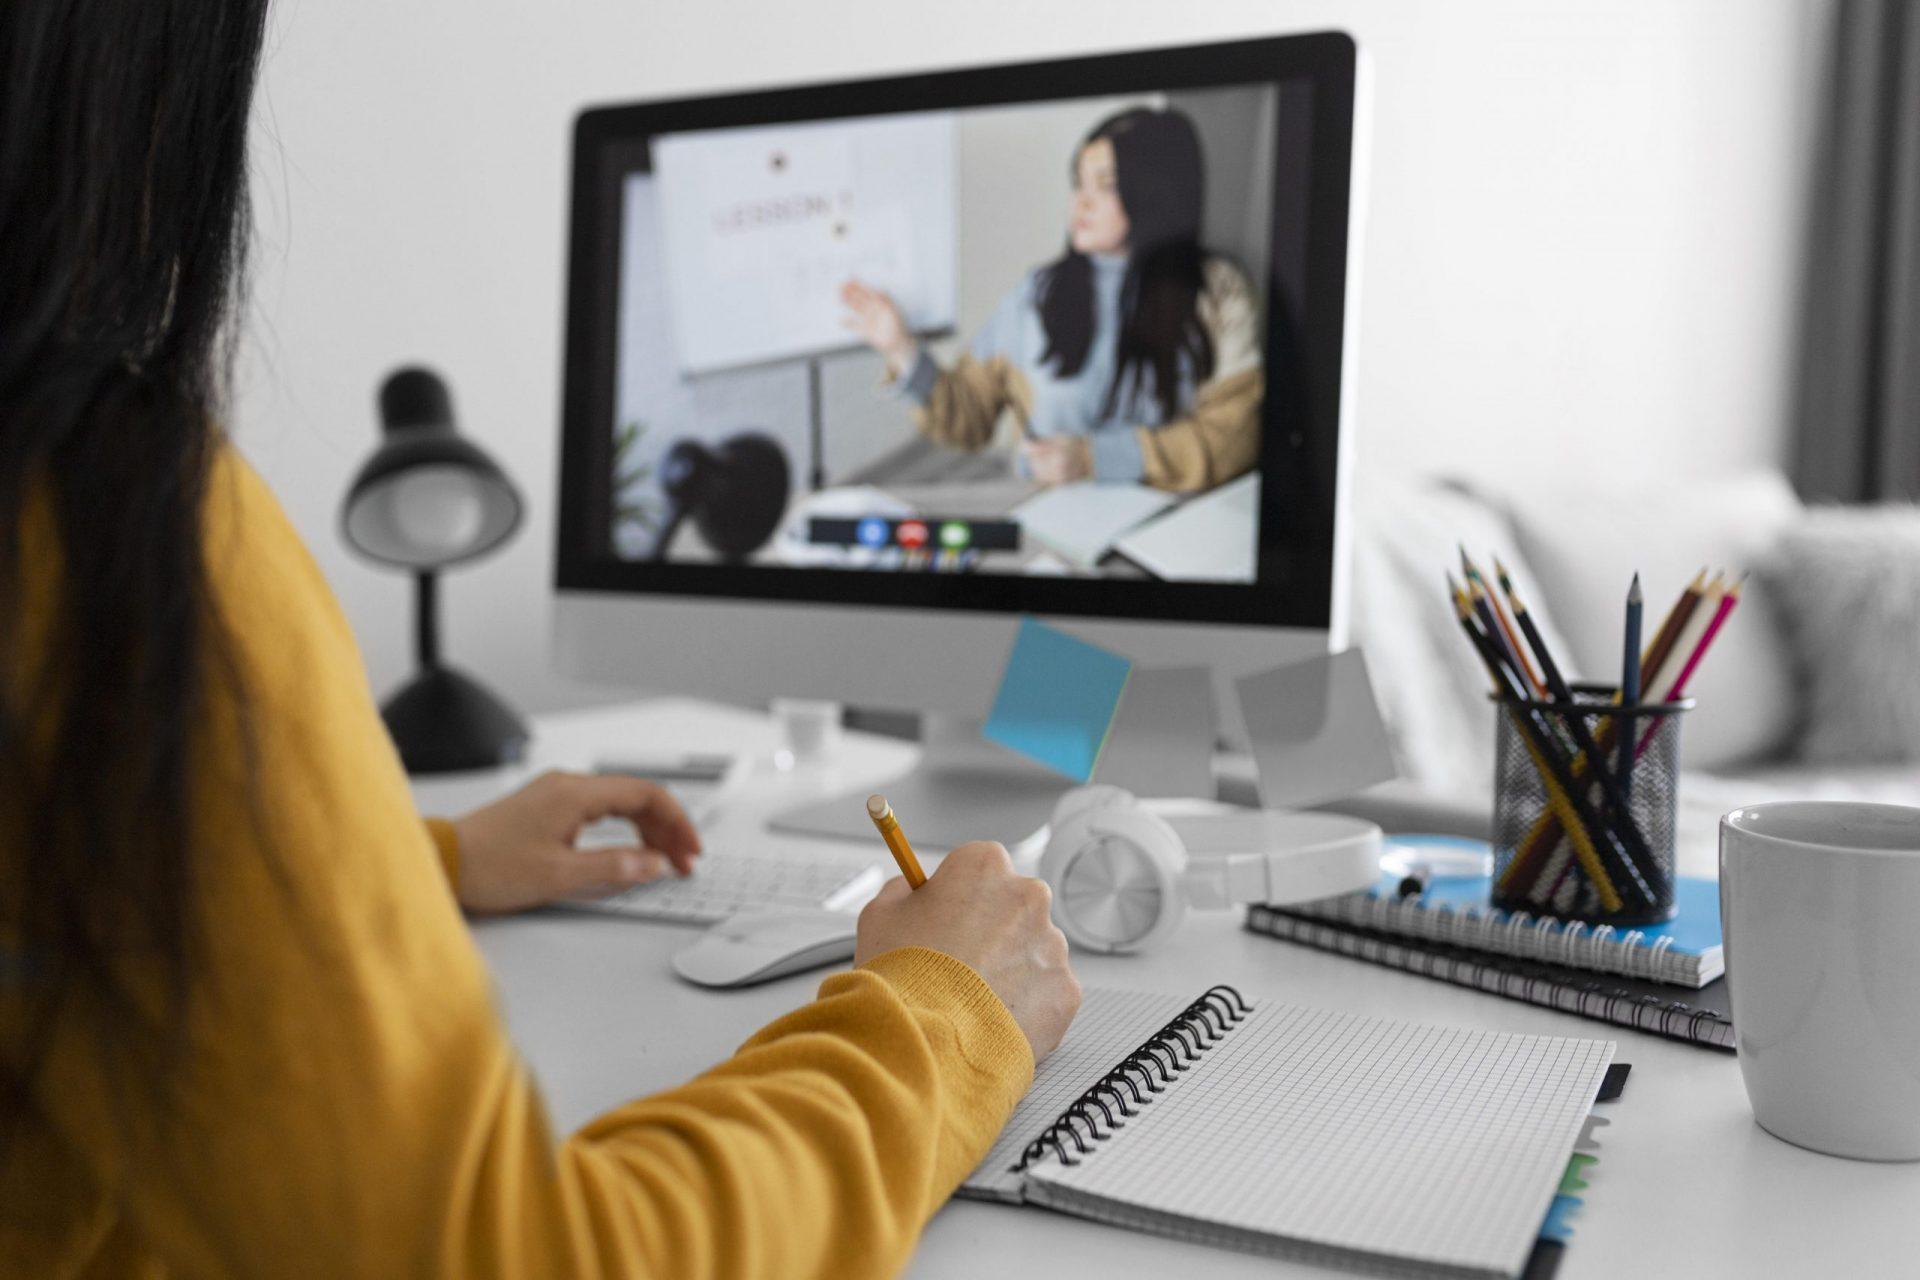 ventajas del e-learning